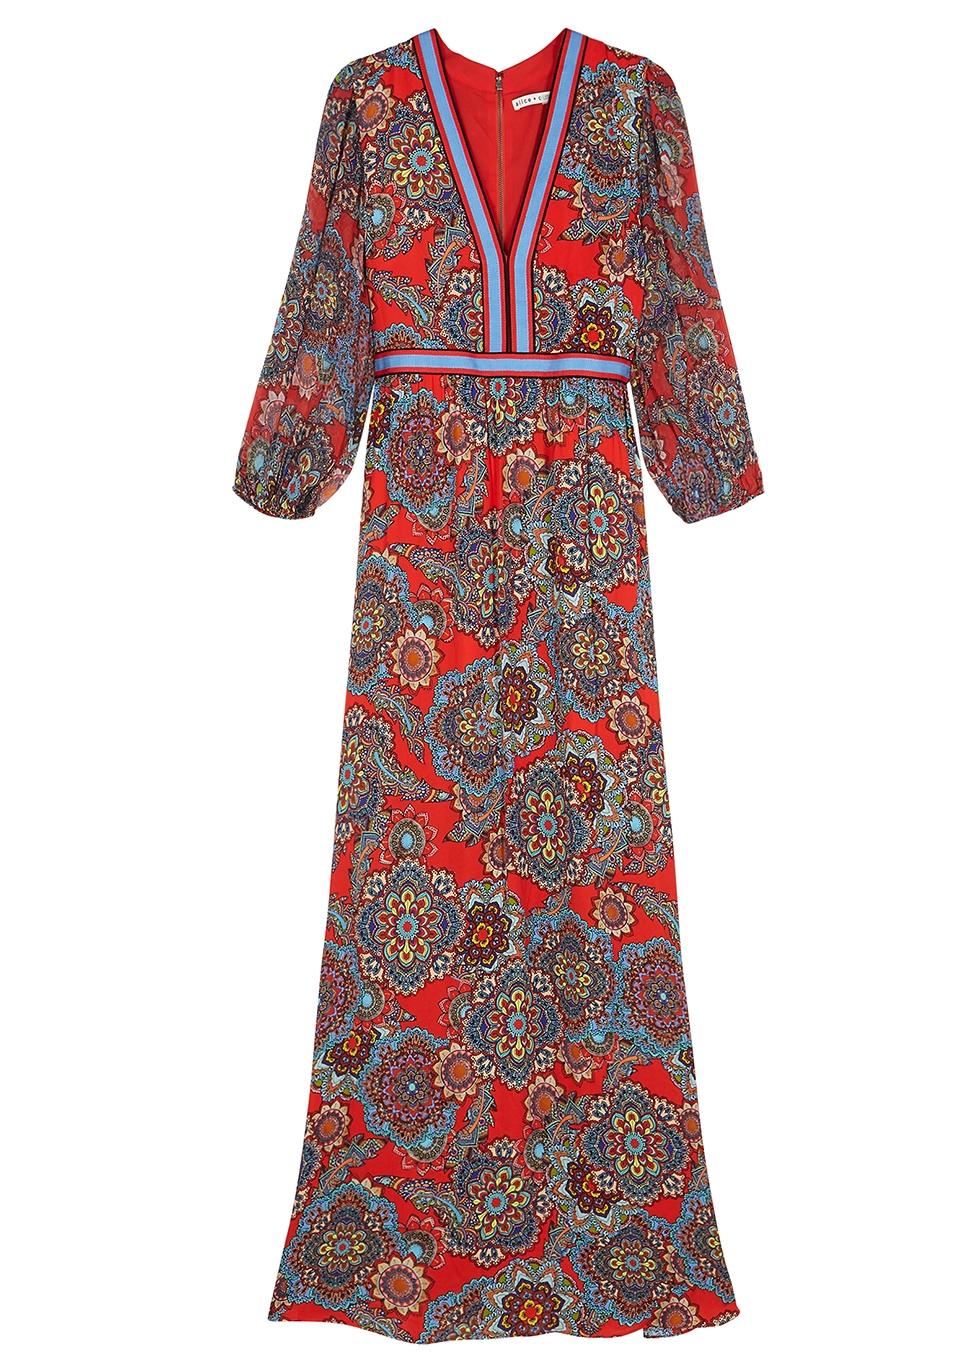 Jaida printed maxi dress - Alice + Olivia